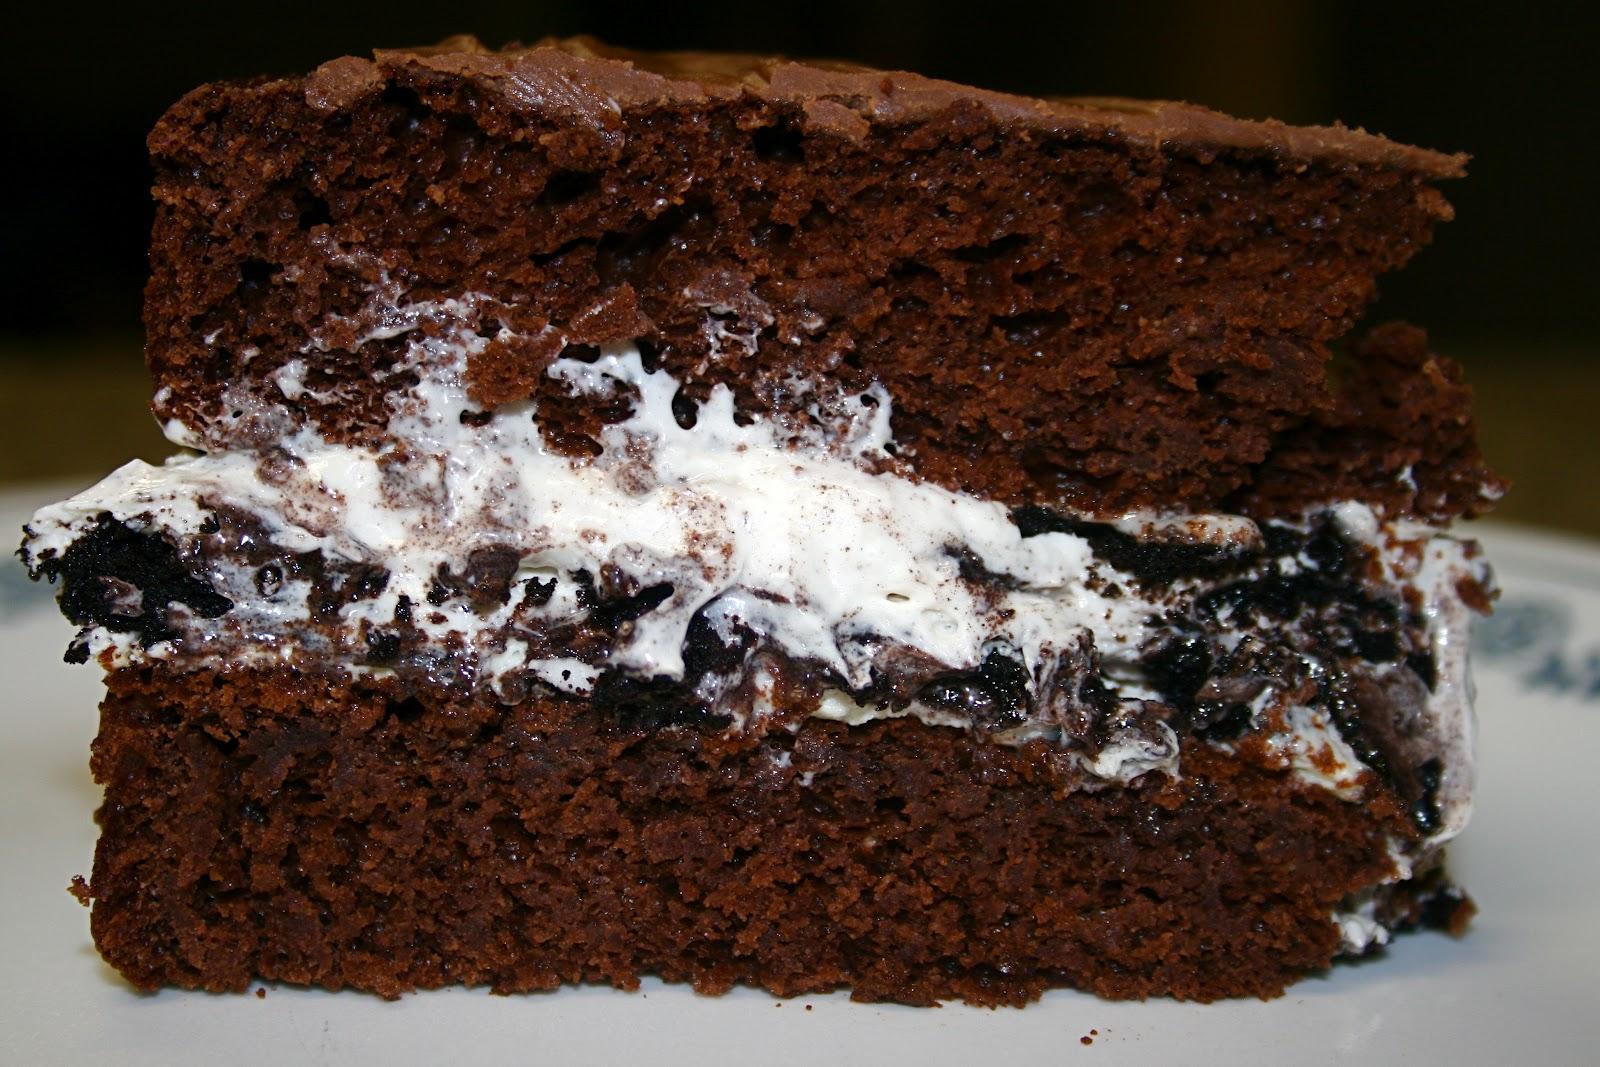 Sugar Amp Spice Chocolate Oreo Cookie Cake